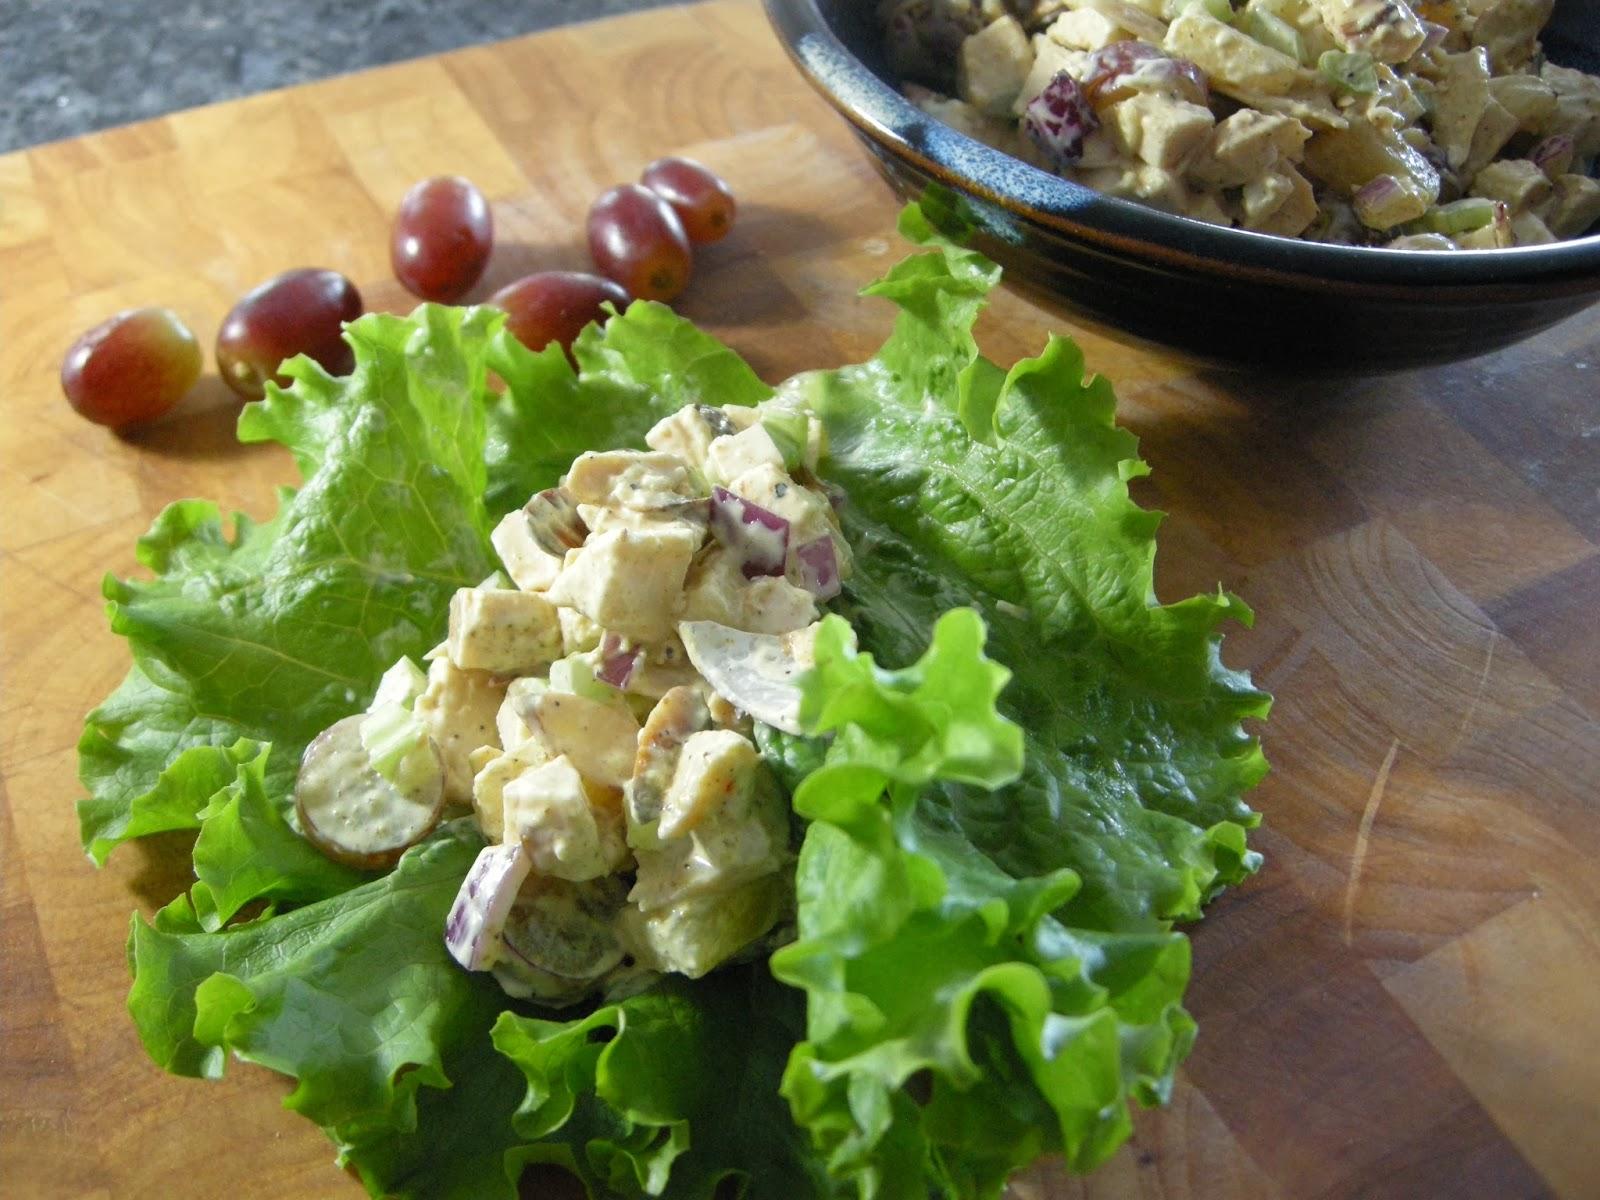 ... Monkey Business: Turkey Moreovers! Rosie Makes Curried Turkey Salad